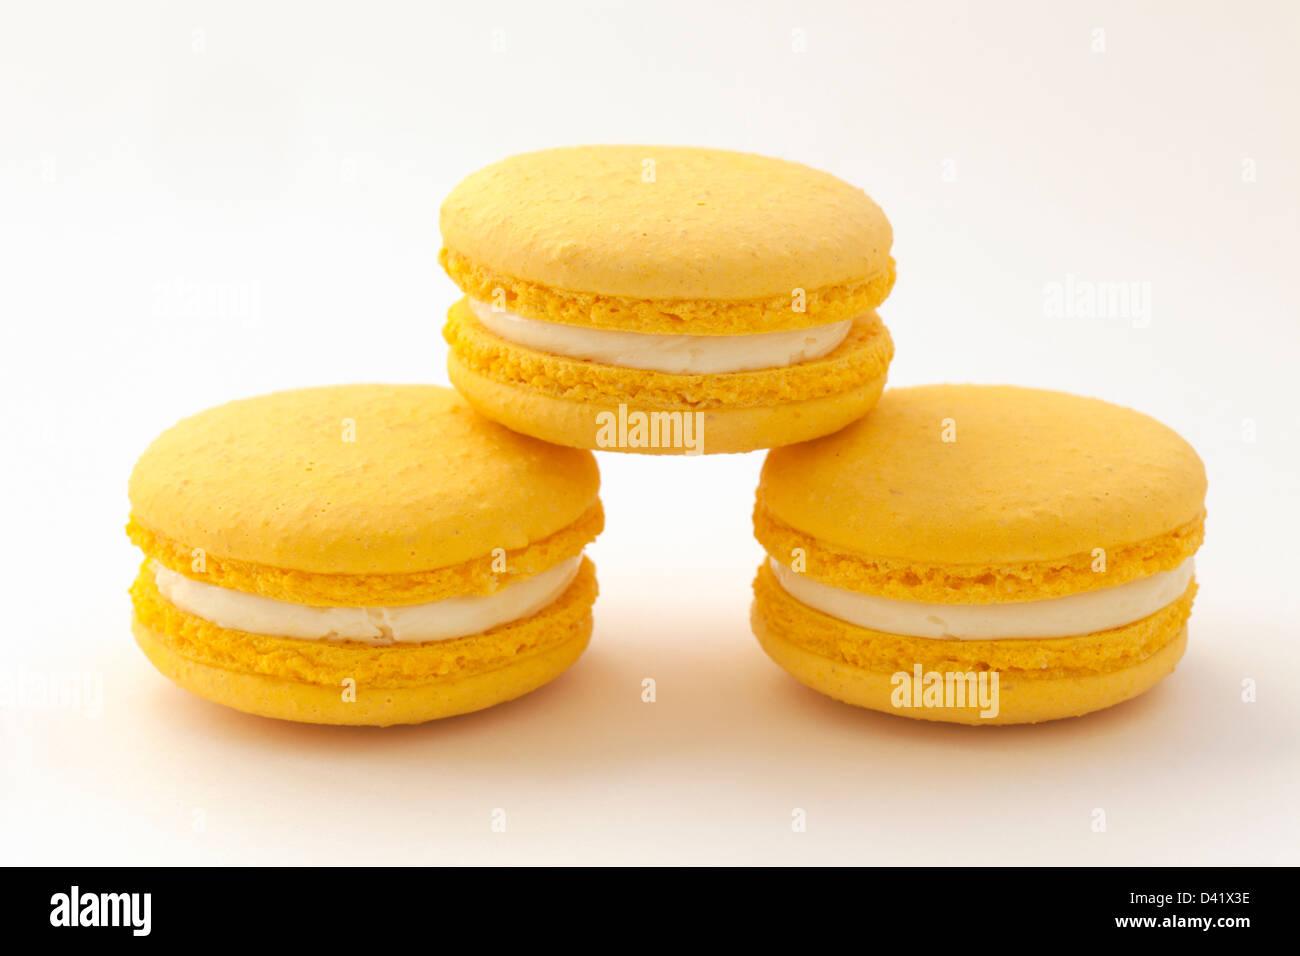 Lemon flavoured macarons - Stock Image